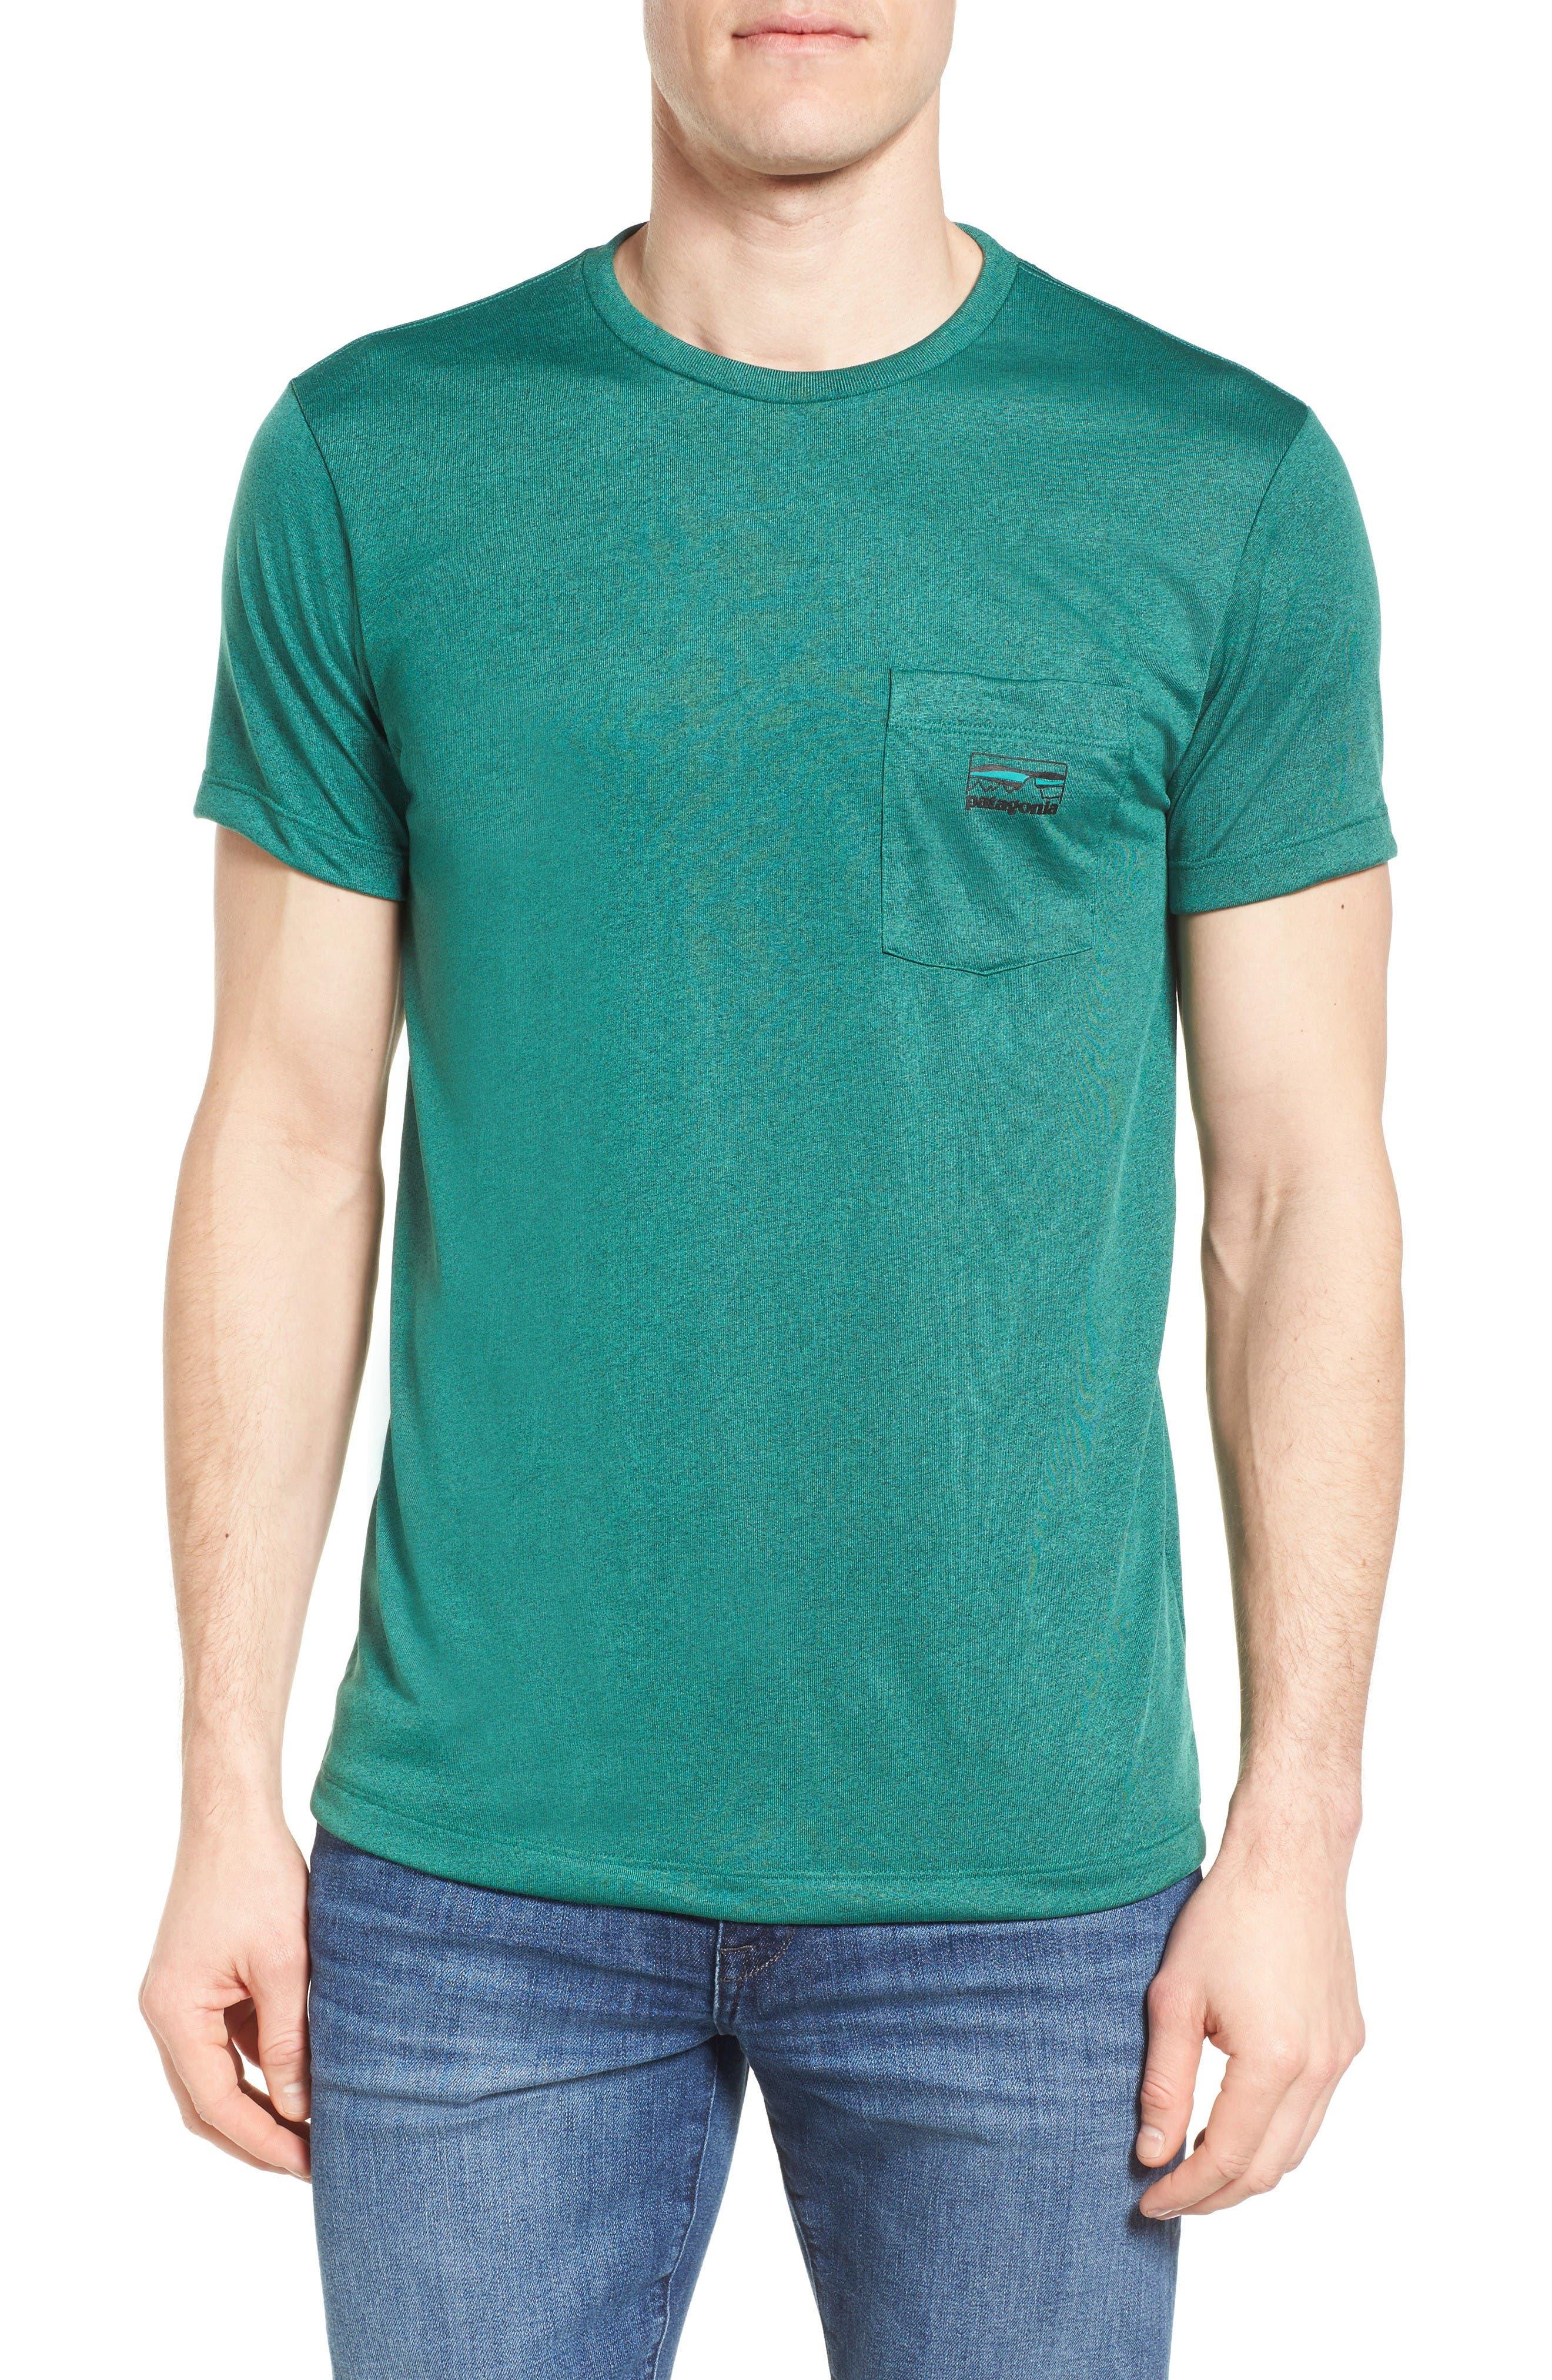 '73 Logo Slim Fit T-Shirt,                         Main,                         color, Gem Green